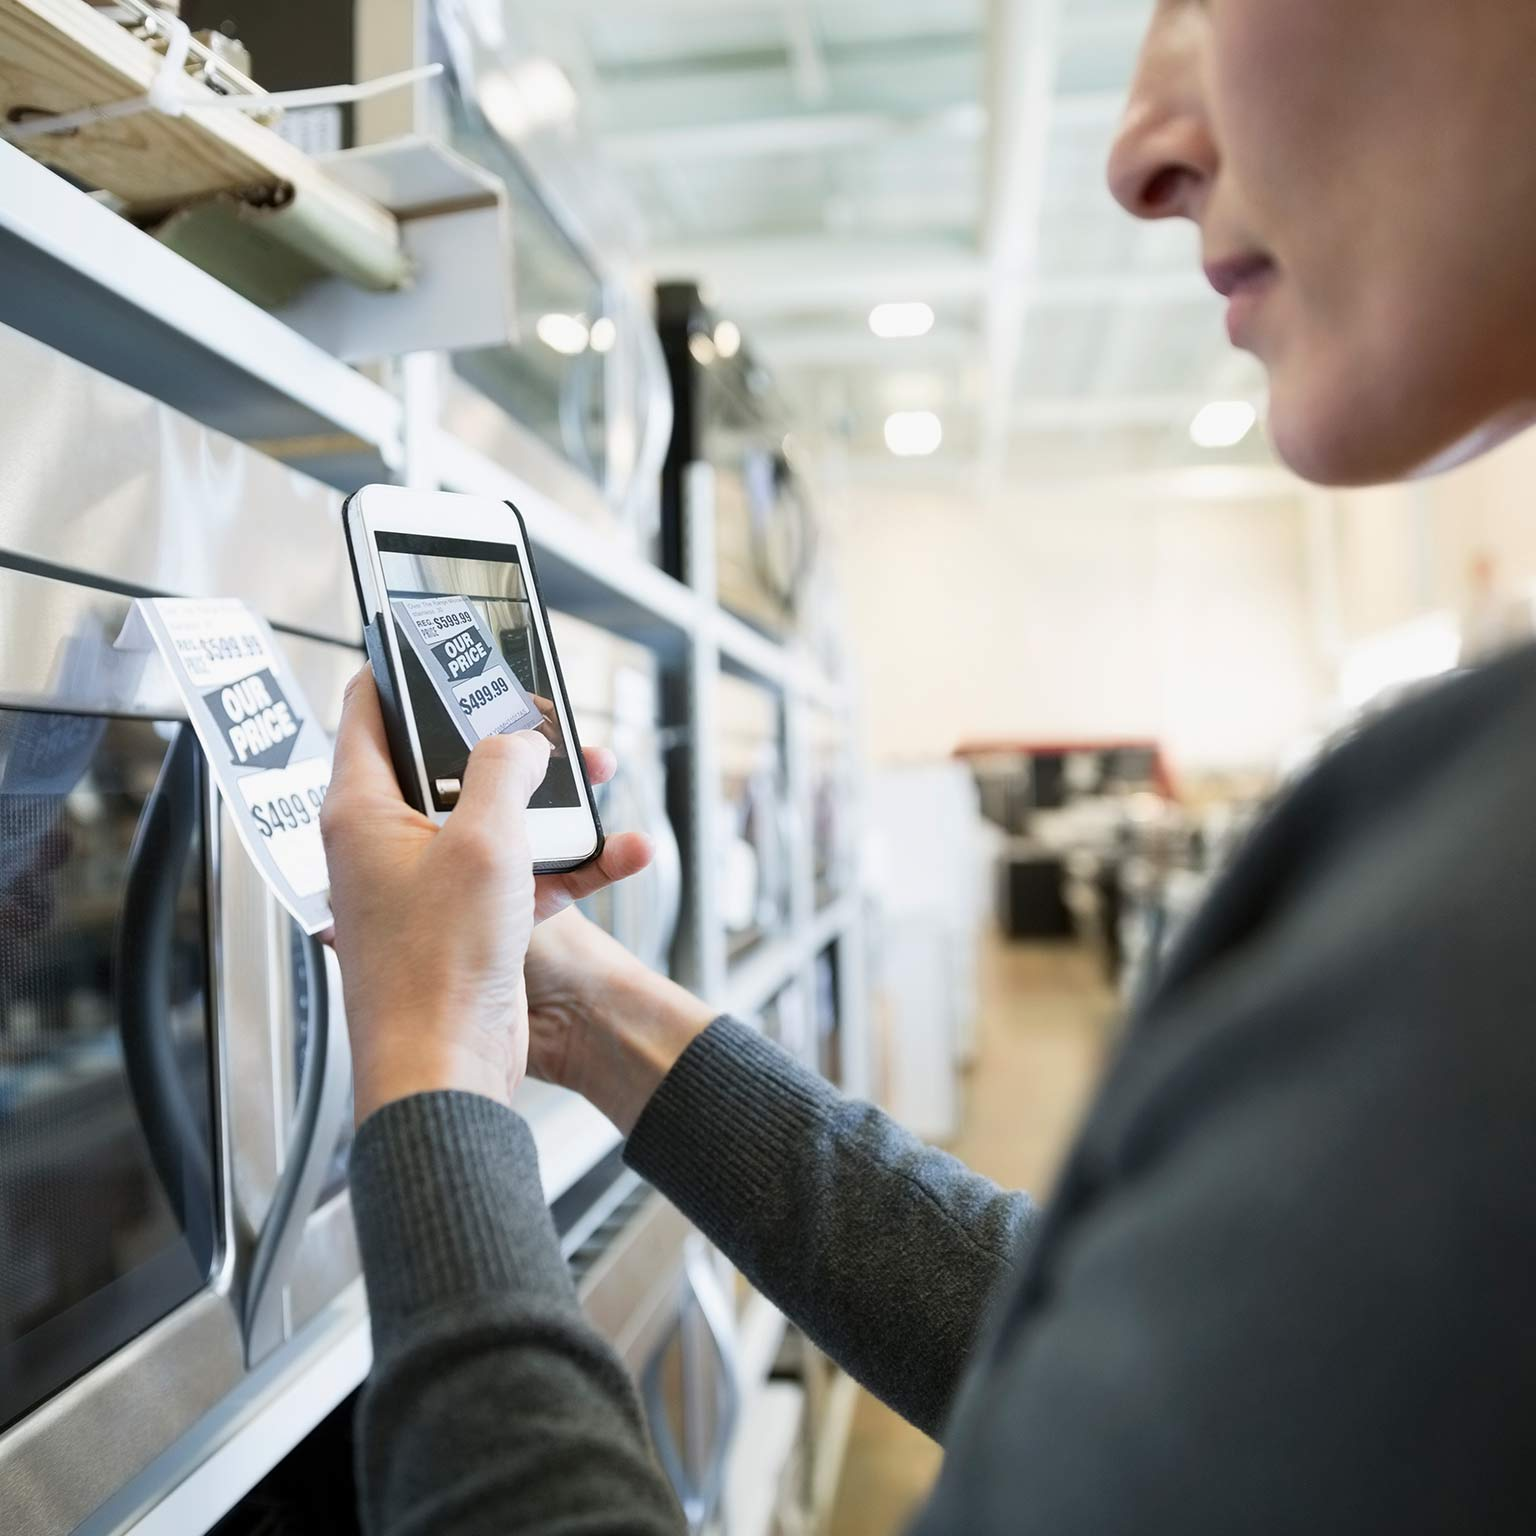 Rethinking customer journeys with the next-generation operating model